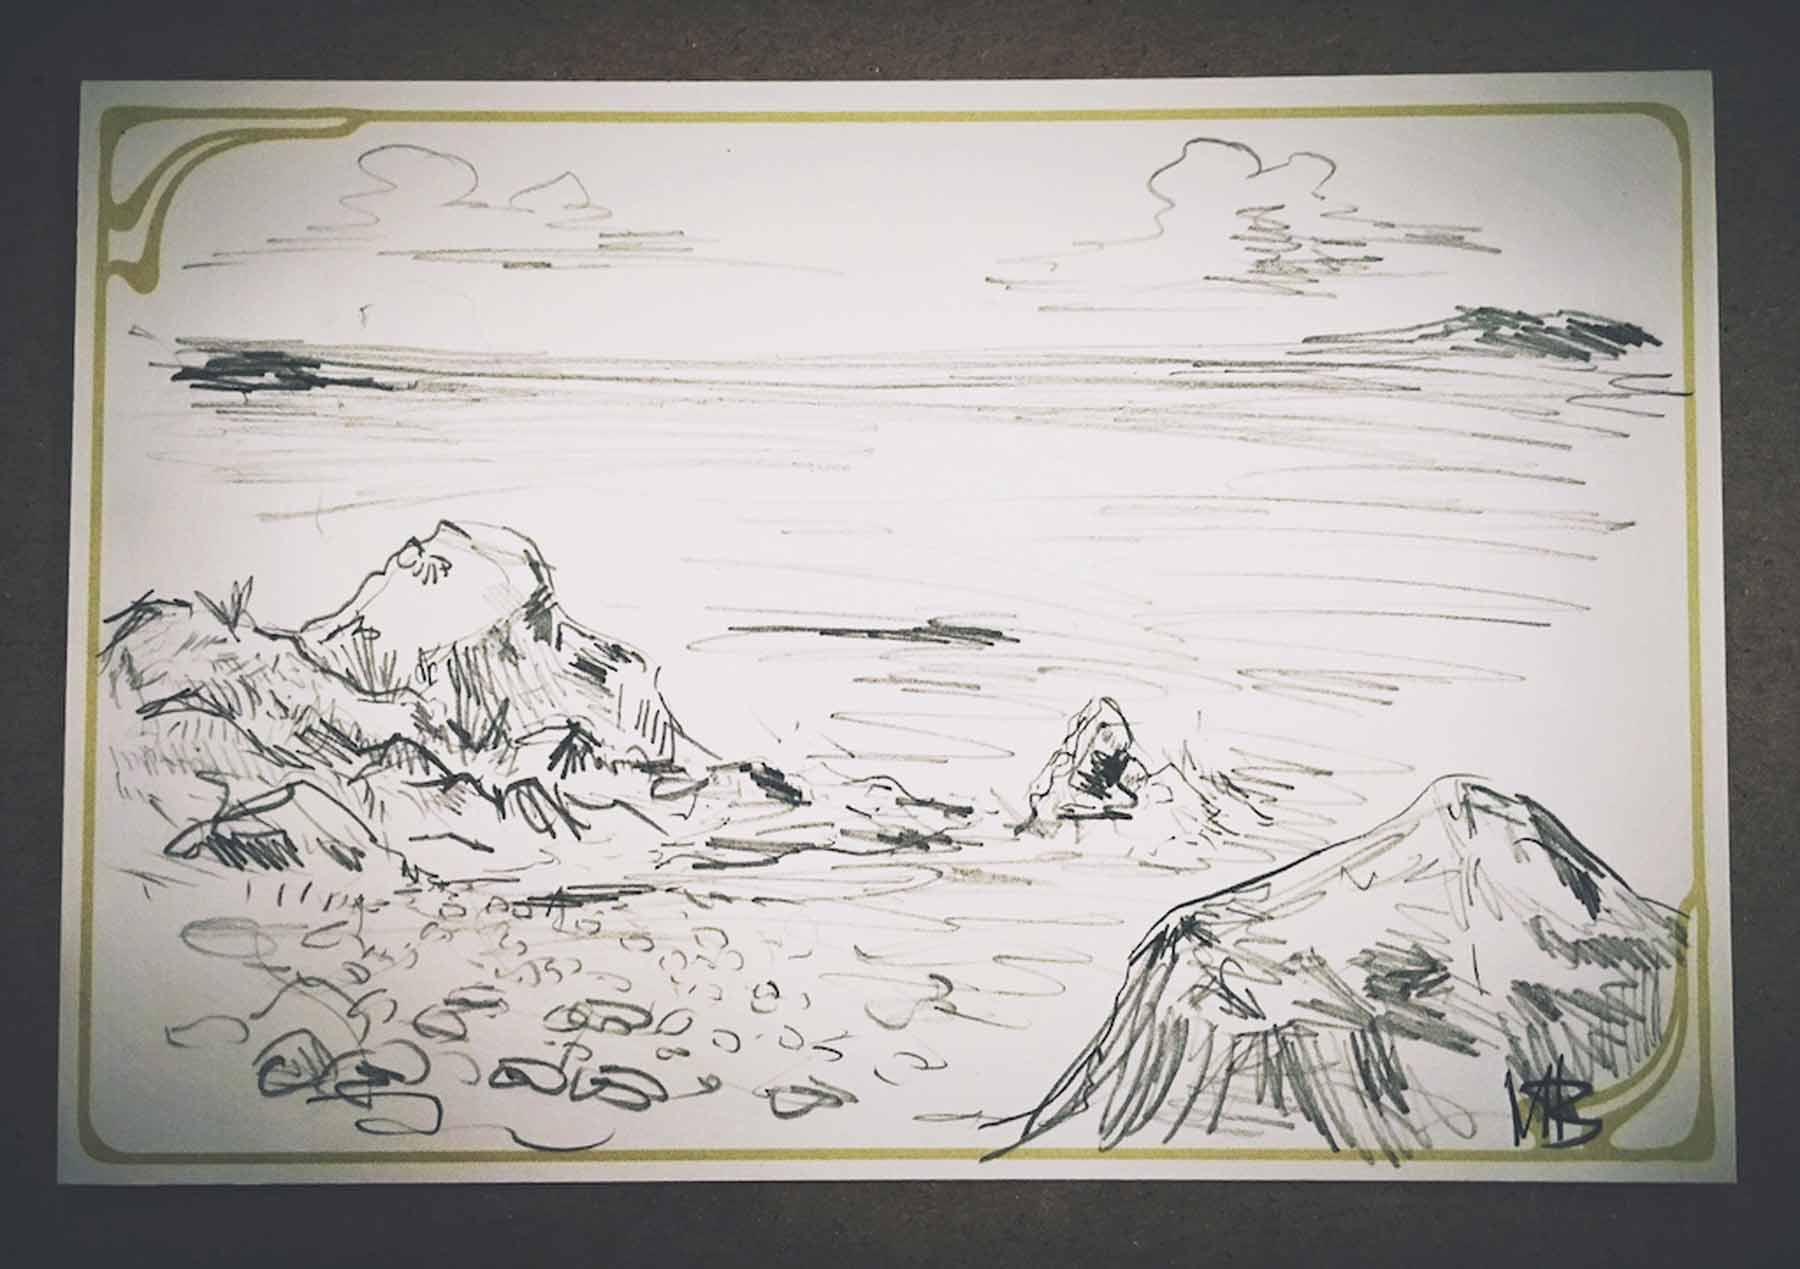 Doodled landscape on postcard left for the scrapbook. Photo by Paige Besse.